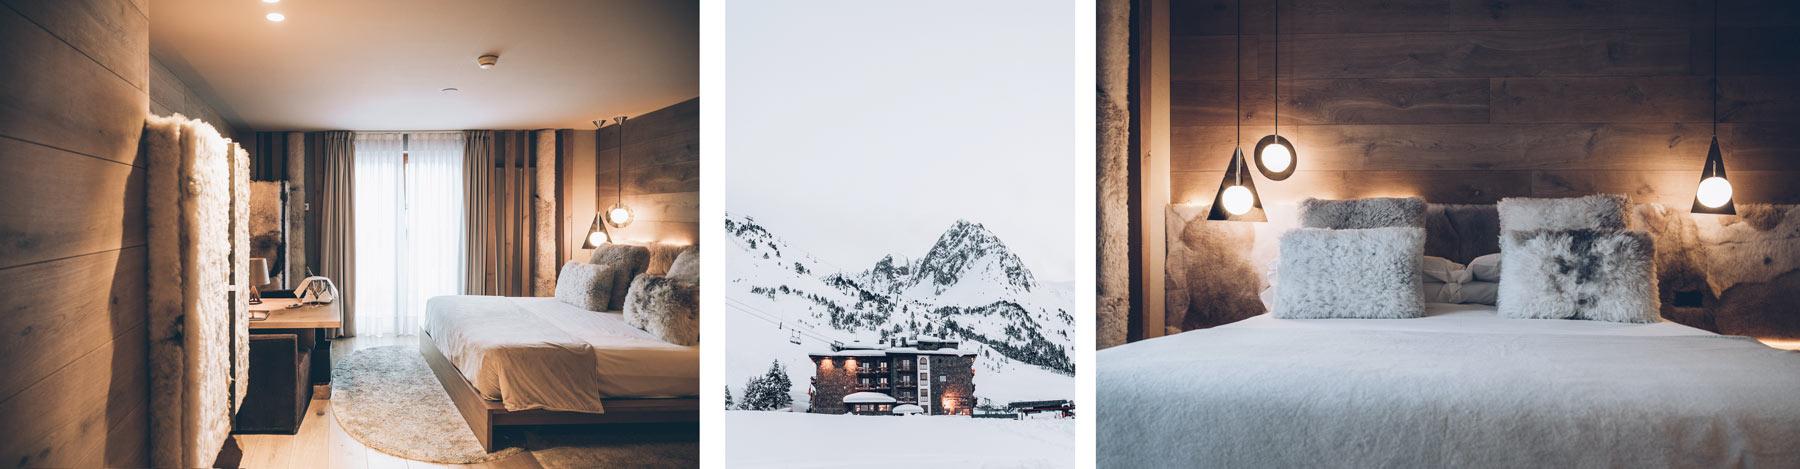 Hotel Grau Roig, Andorre